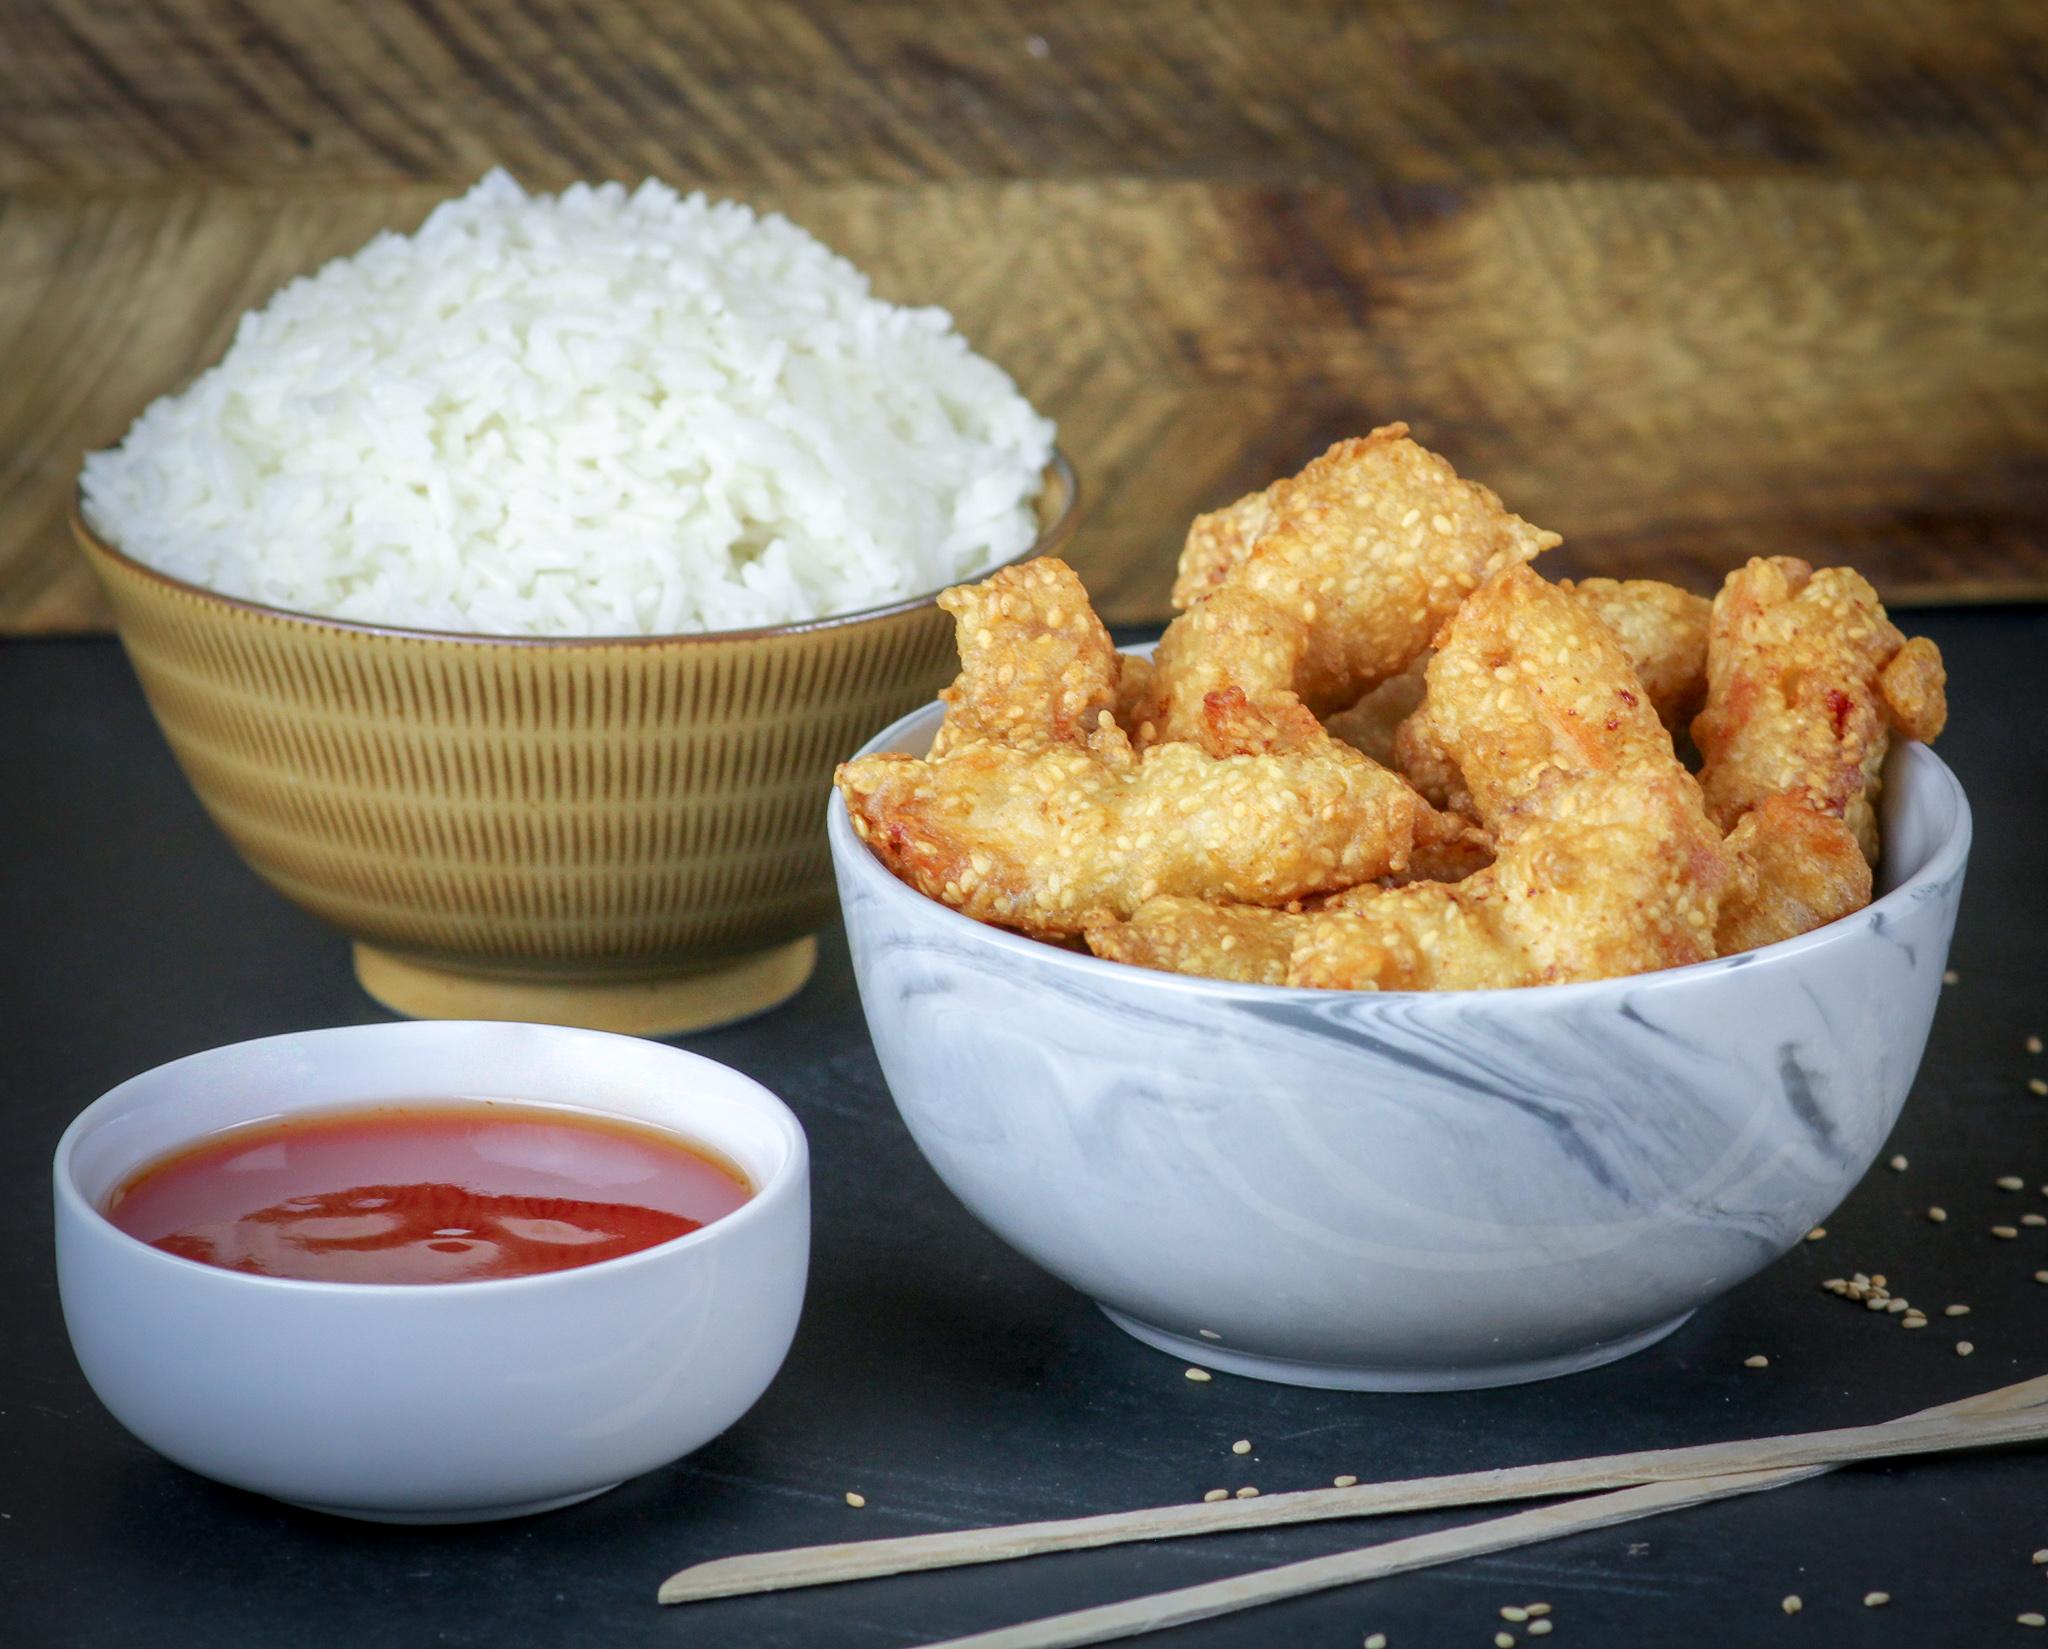 Crispy Crunchy Sesame Chicken